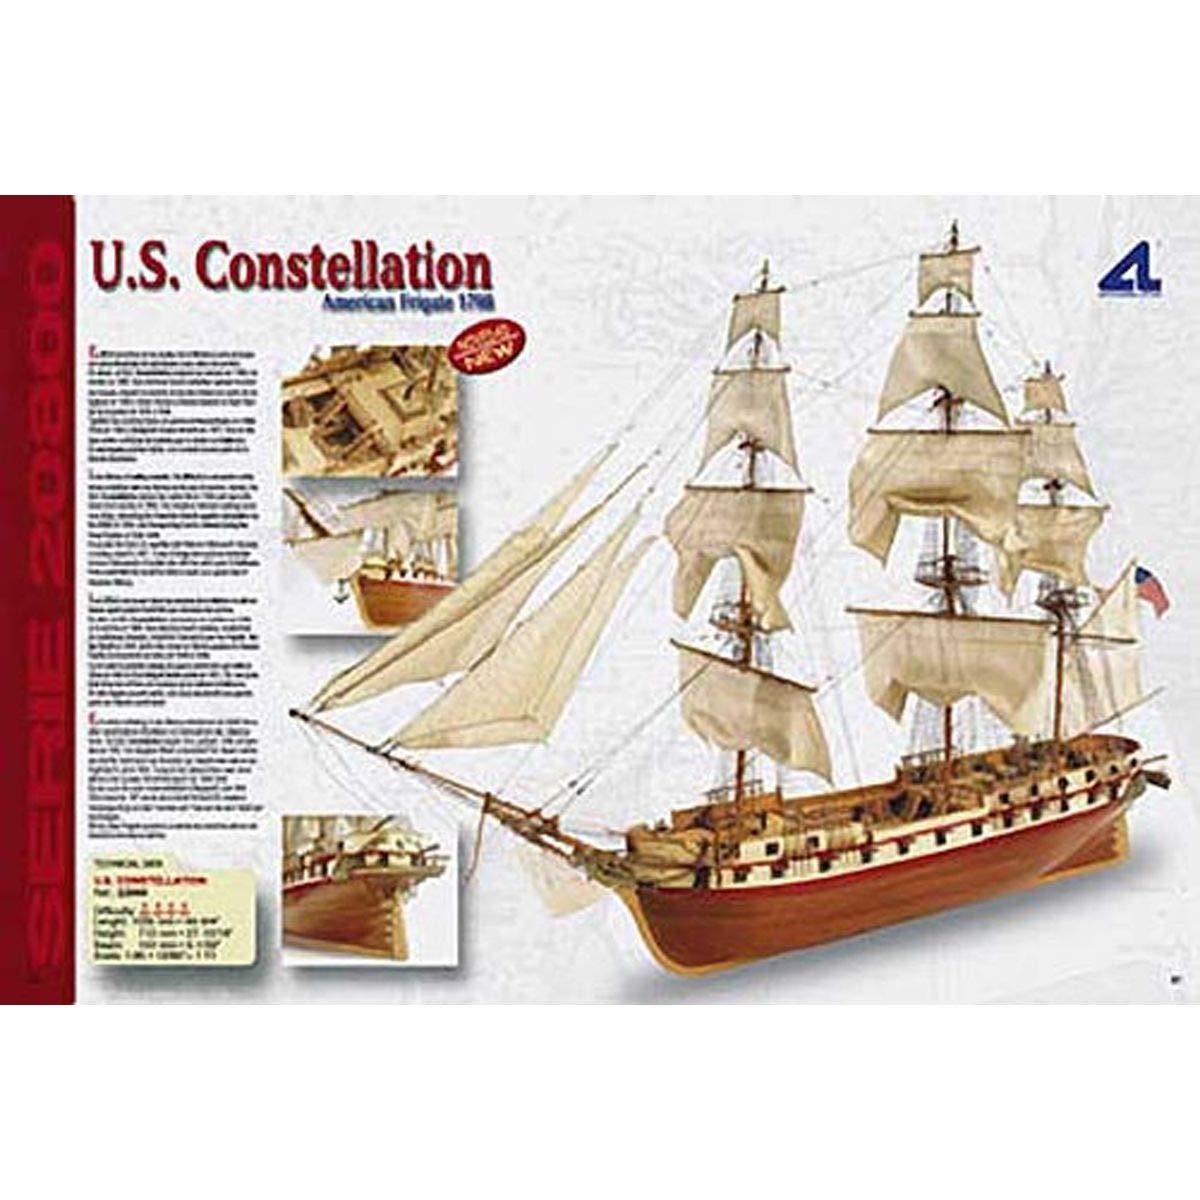 Artesania Latina 22850 1/85 US Frigate 1798 Constellation